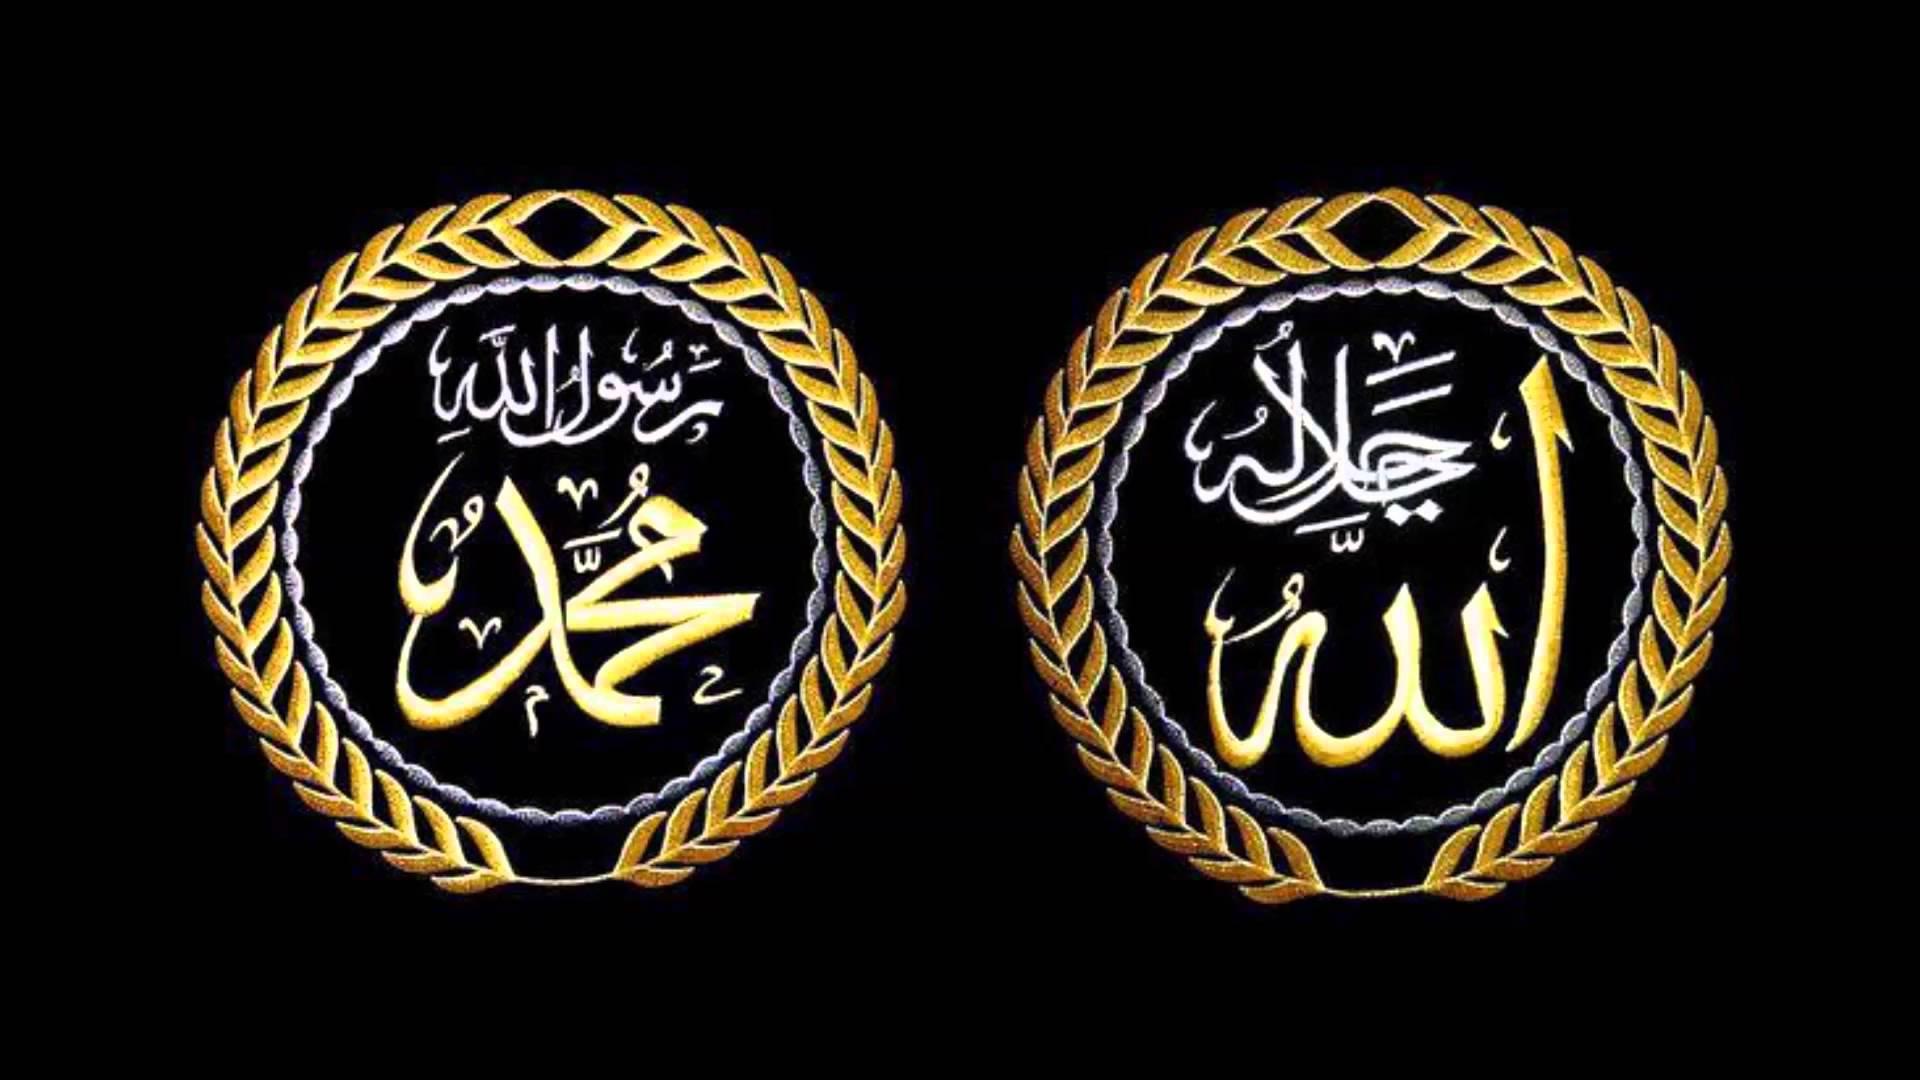 Wallpaper Tulisan Allah   Kaligrafi Muha 1874242   PNG Images   PNGio 1920x1080